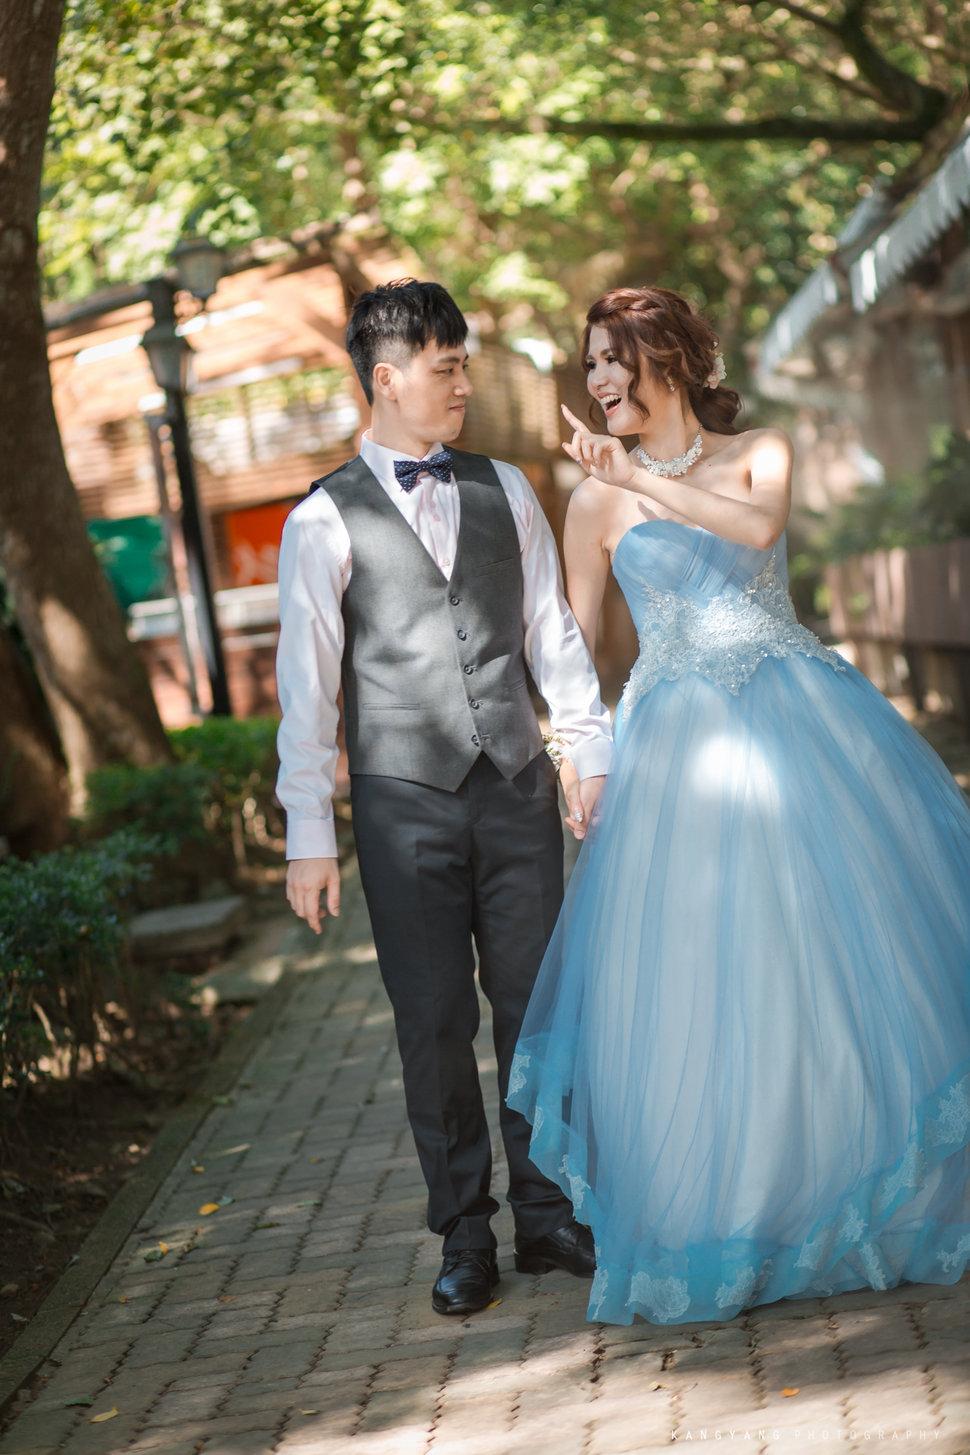 U&M 戶外證婚教堂婚禮@台北青青食尚花園/費加洛教堂(編號:307170) - 婚攝楊康影像Kstudio《結婚吧》